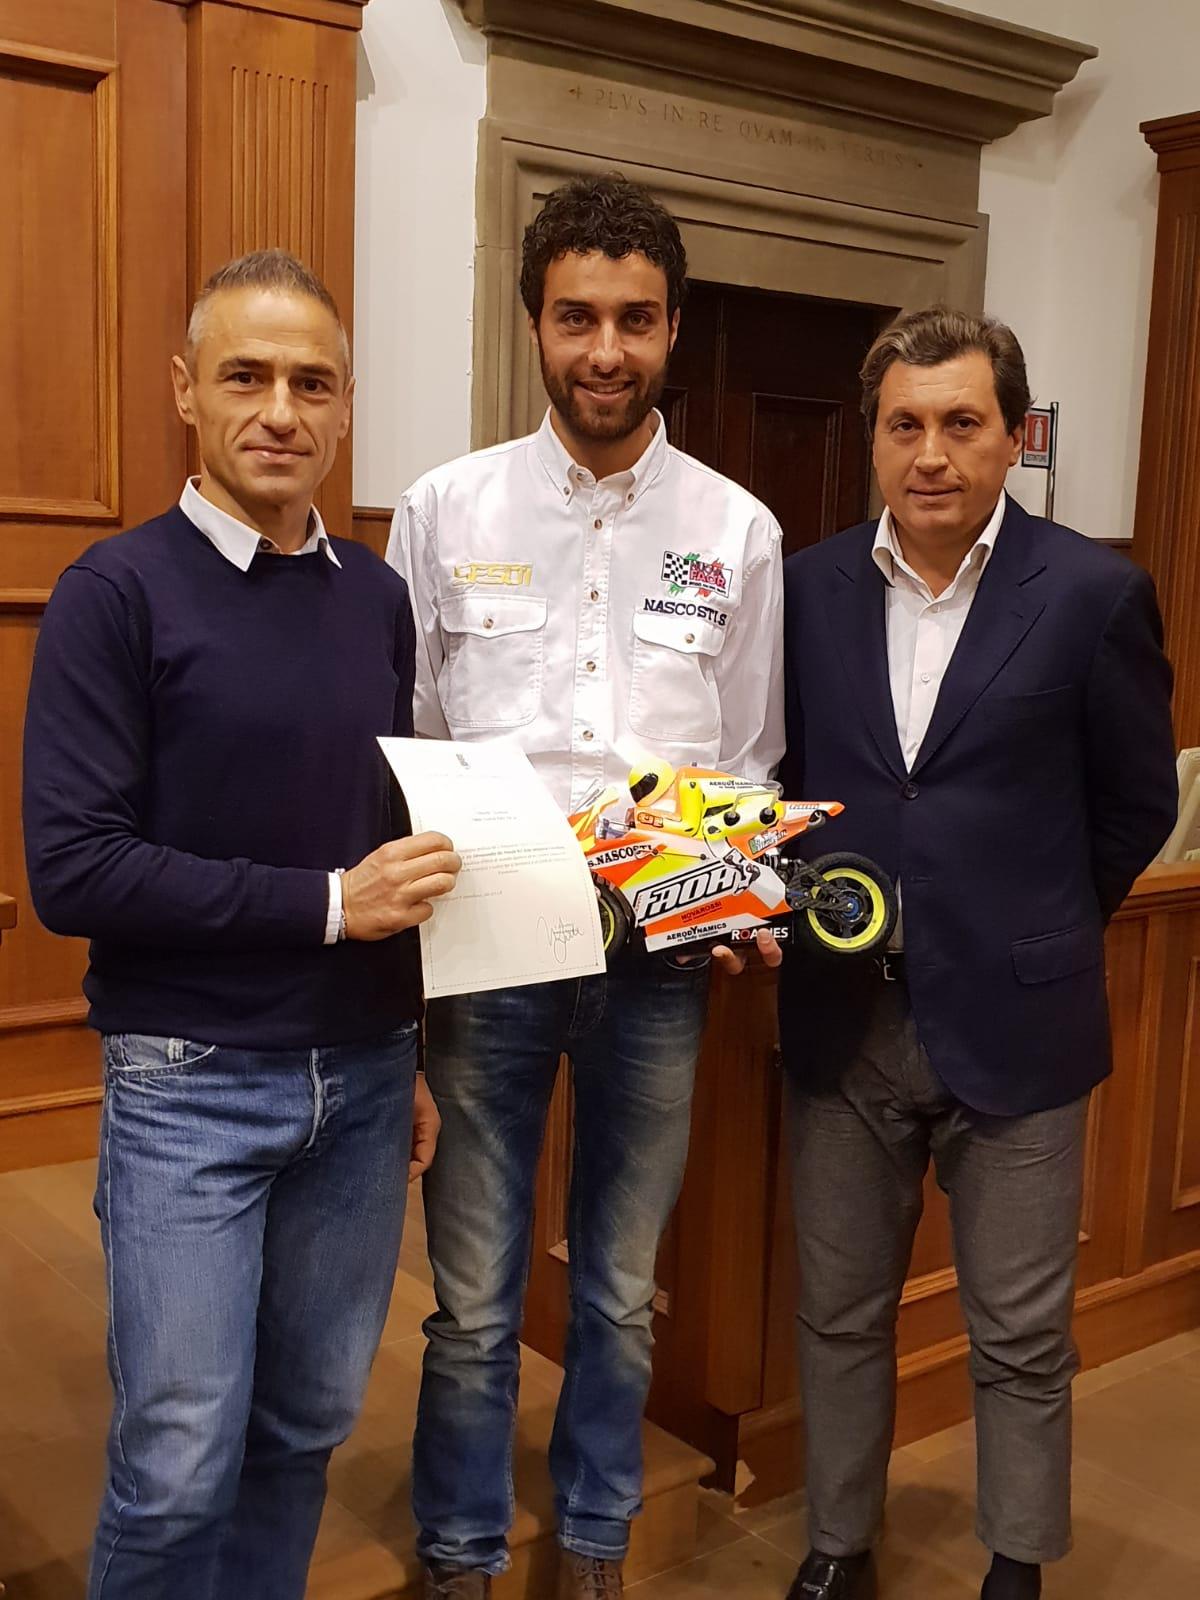 Consegnata pergamena a Simone Nascosti, campione mondiale di RC bike categoria Nitrobike